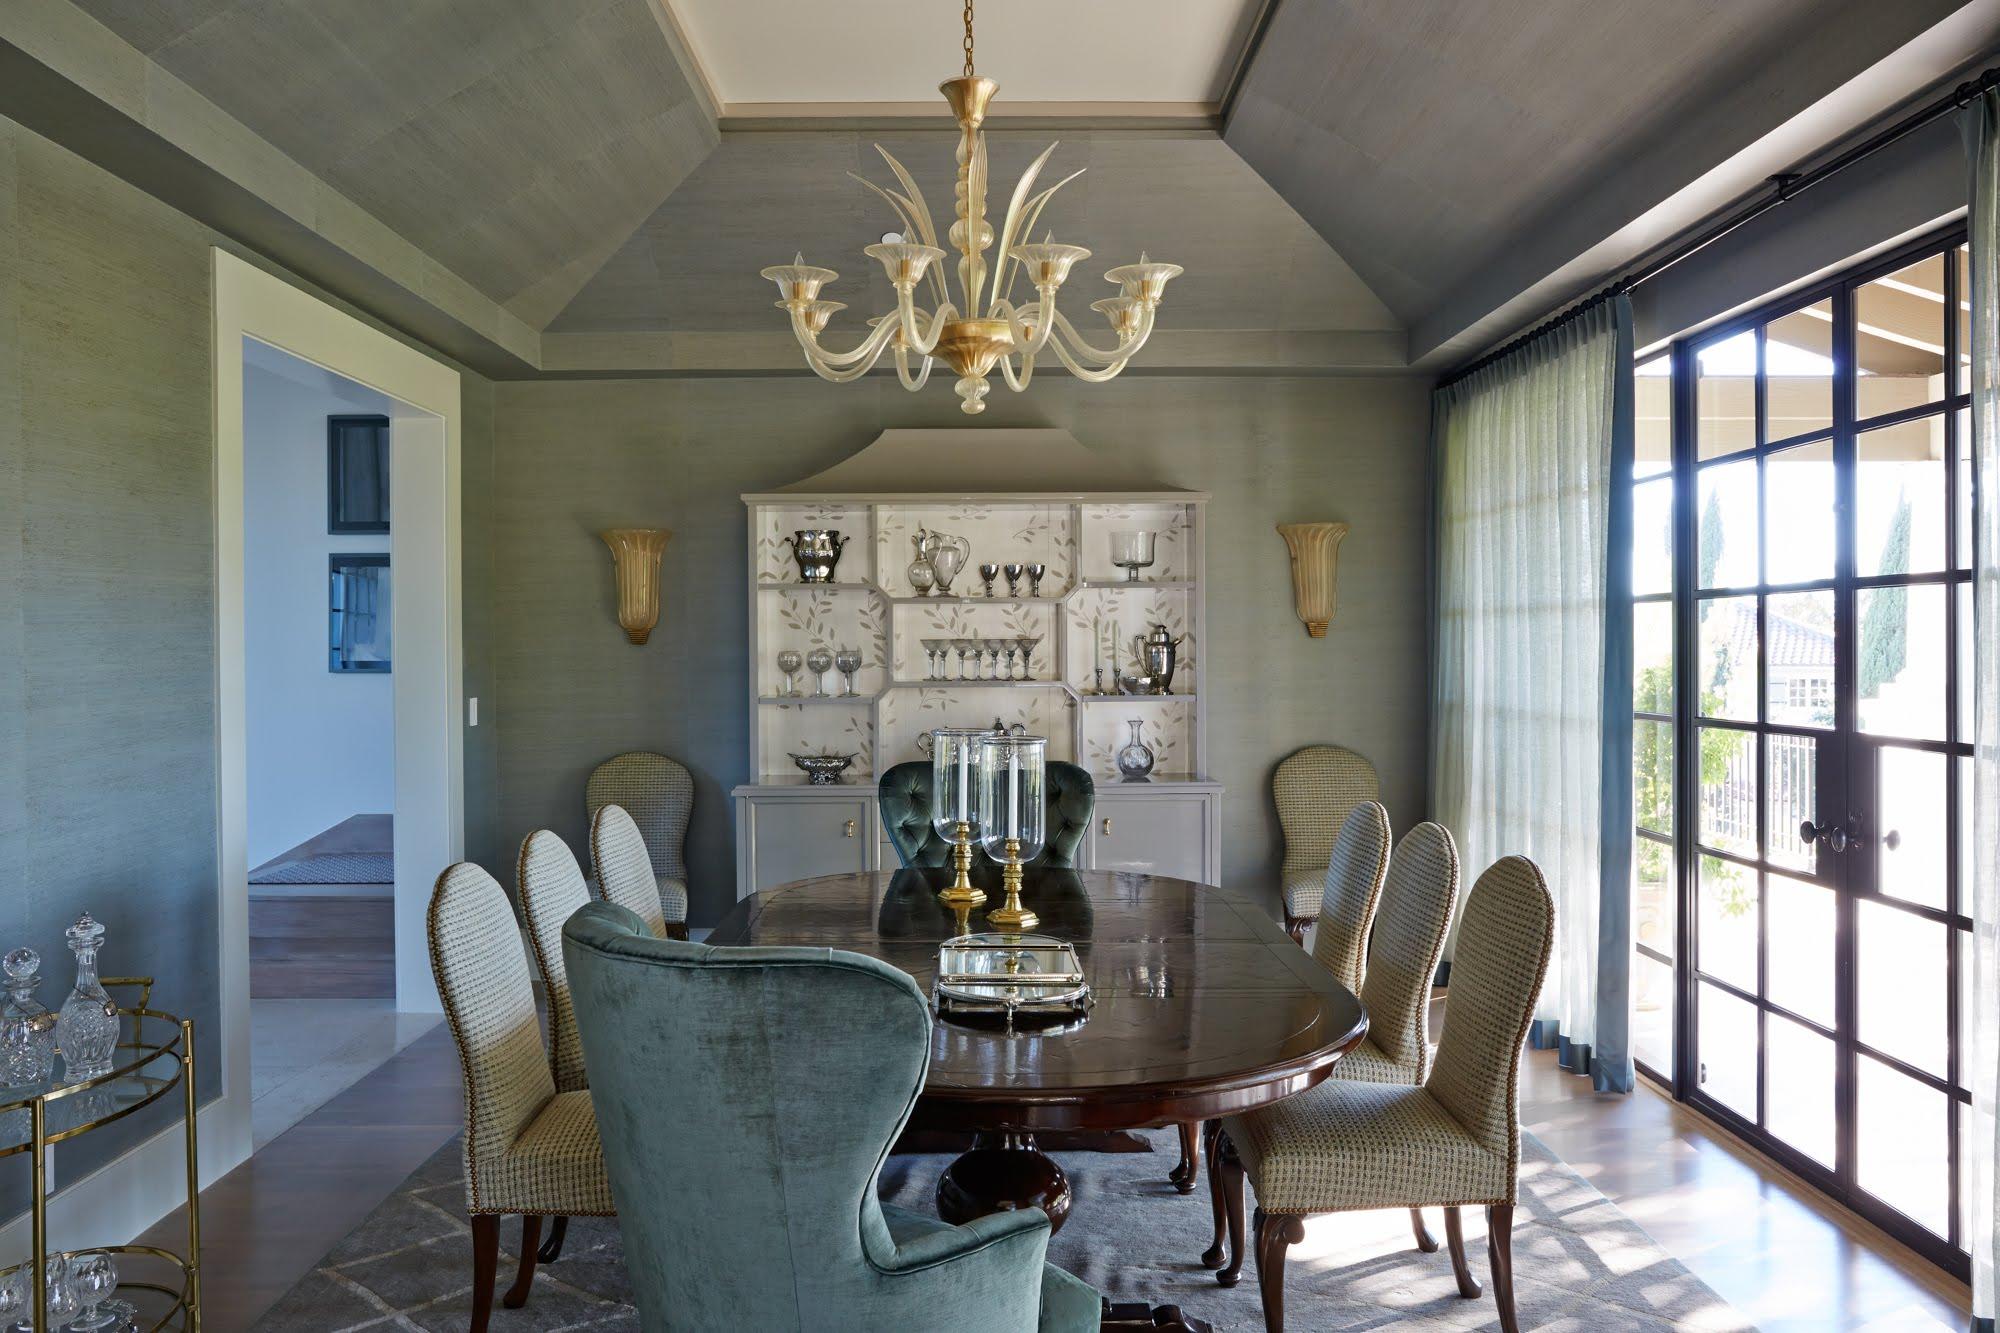 William_Hefner_beverly_crest_projects_Barnett__DR_dining_room_01